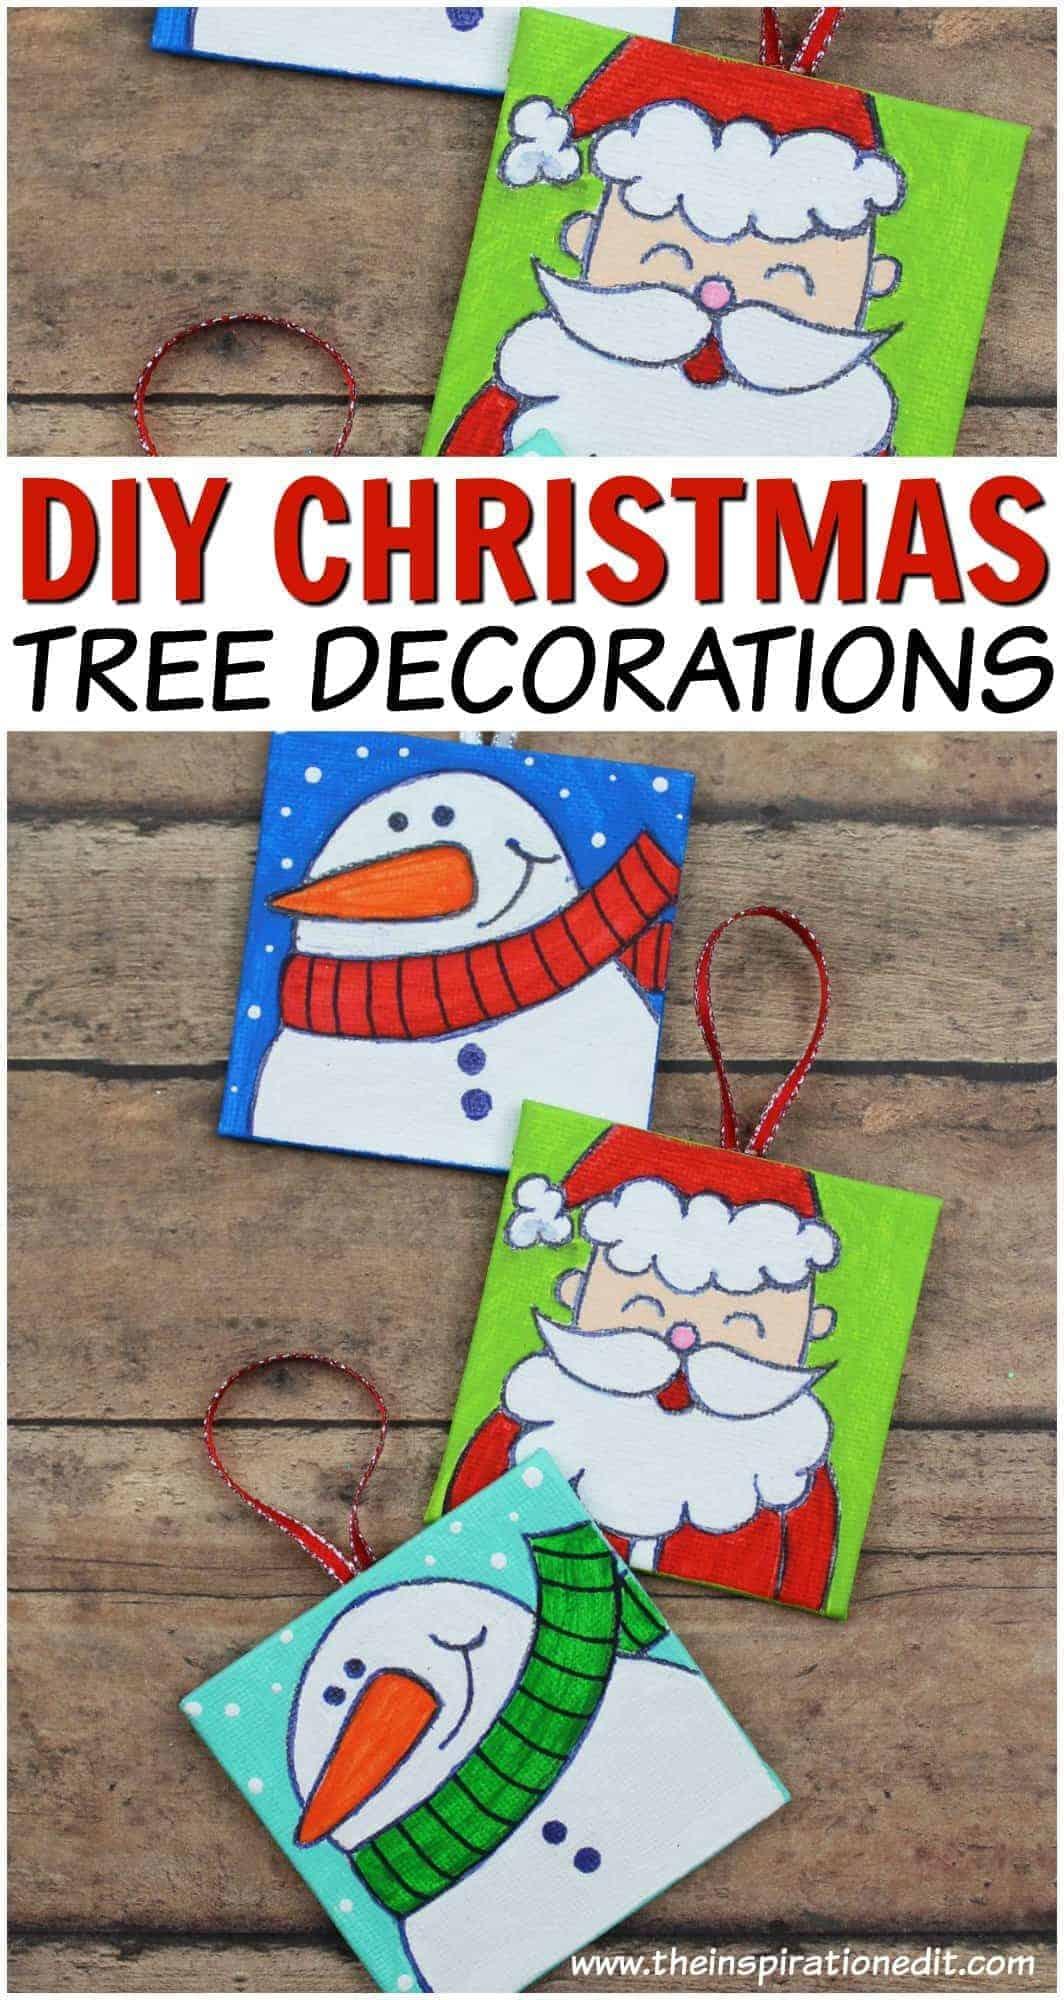 DIY Christmas Tree Decorations